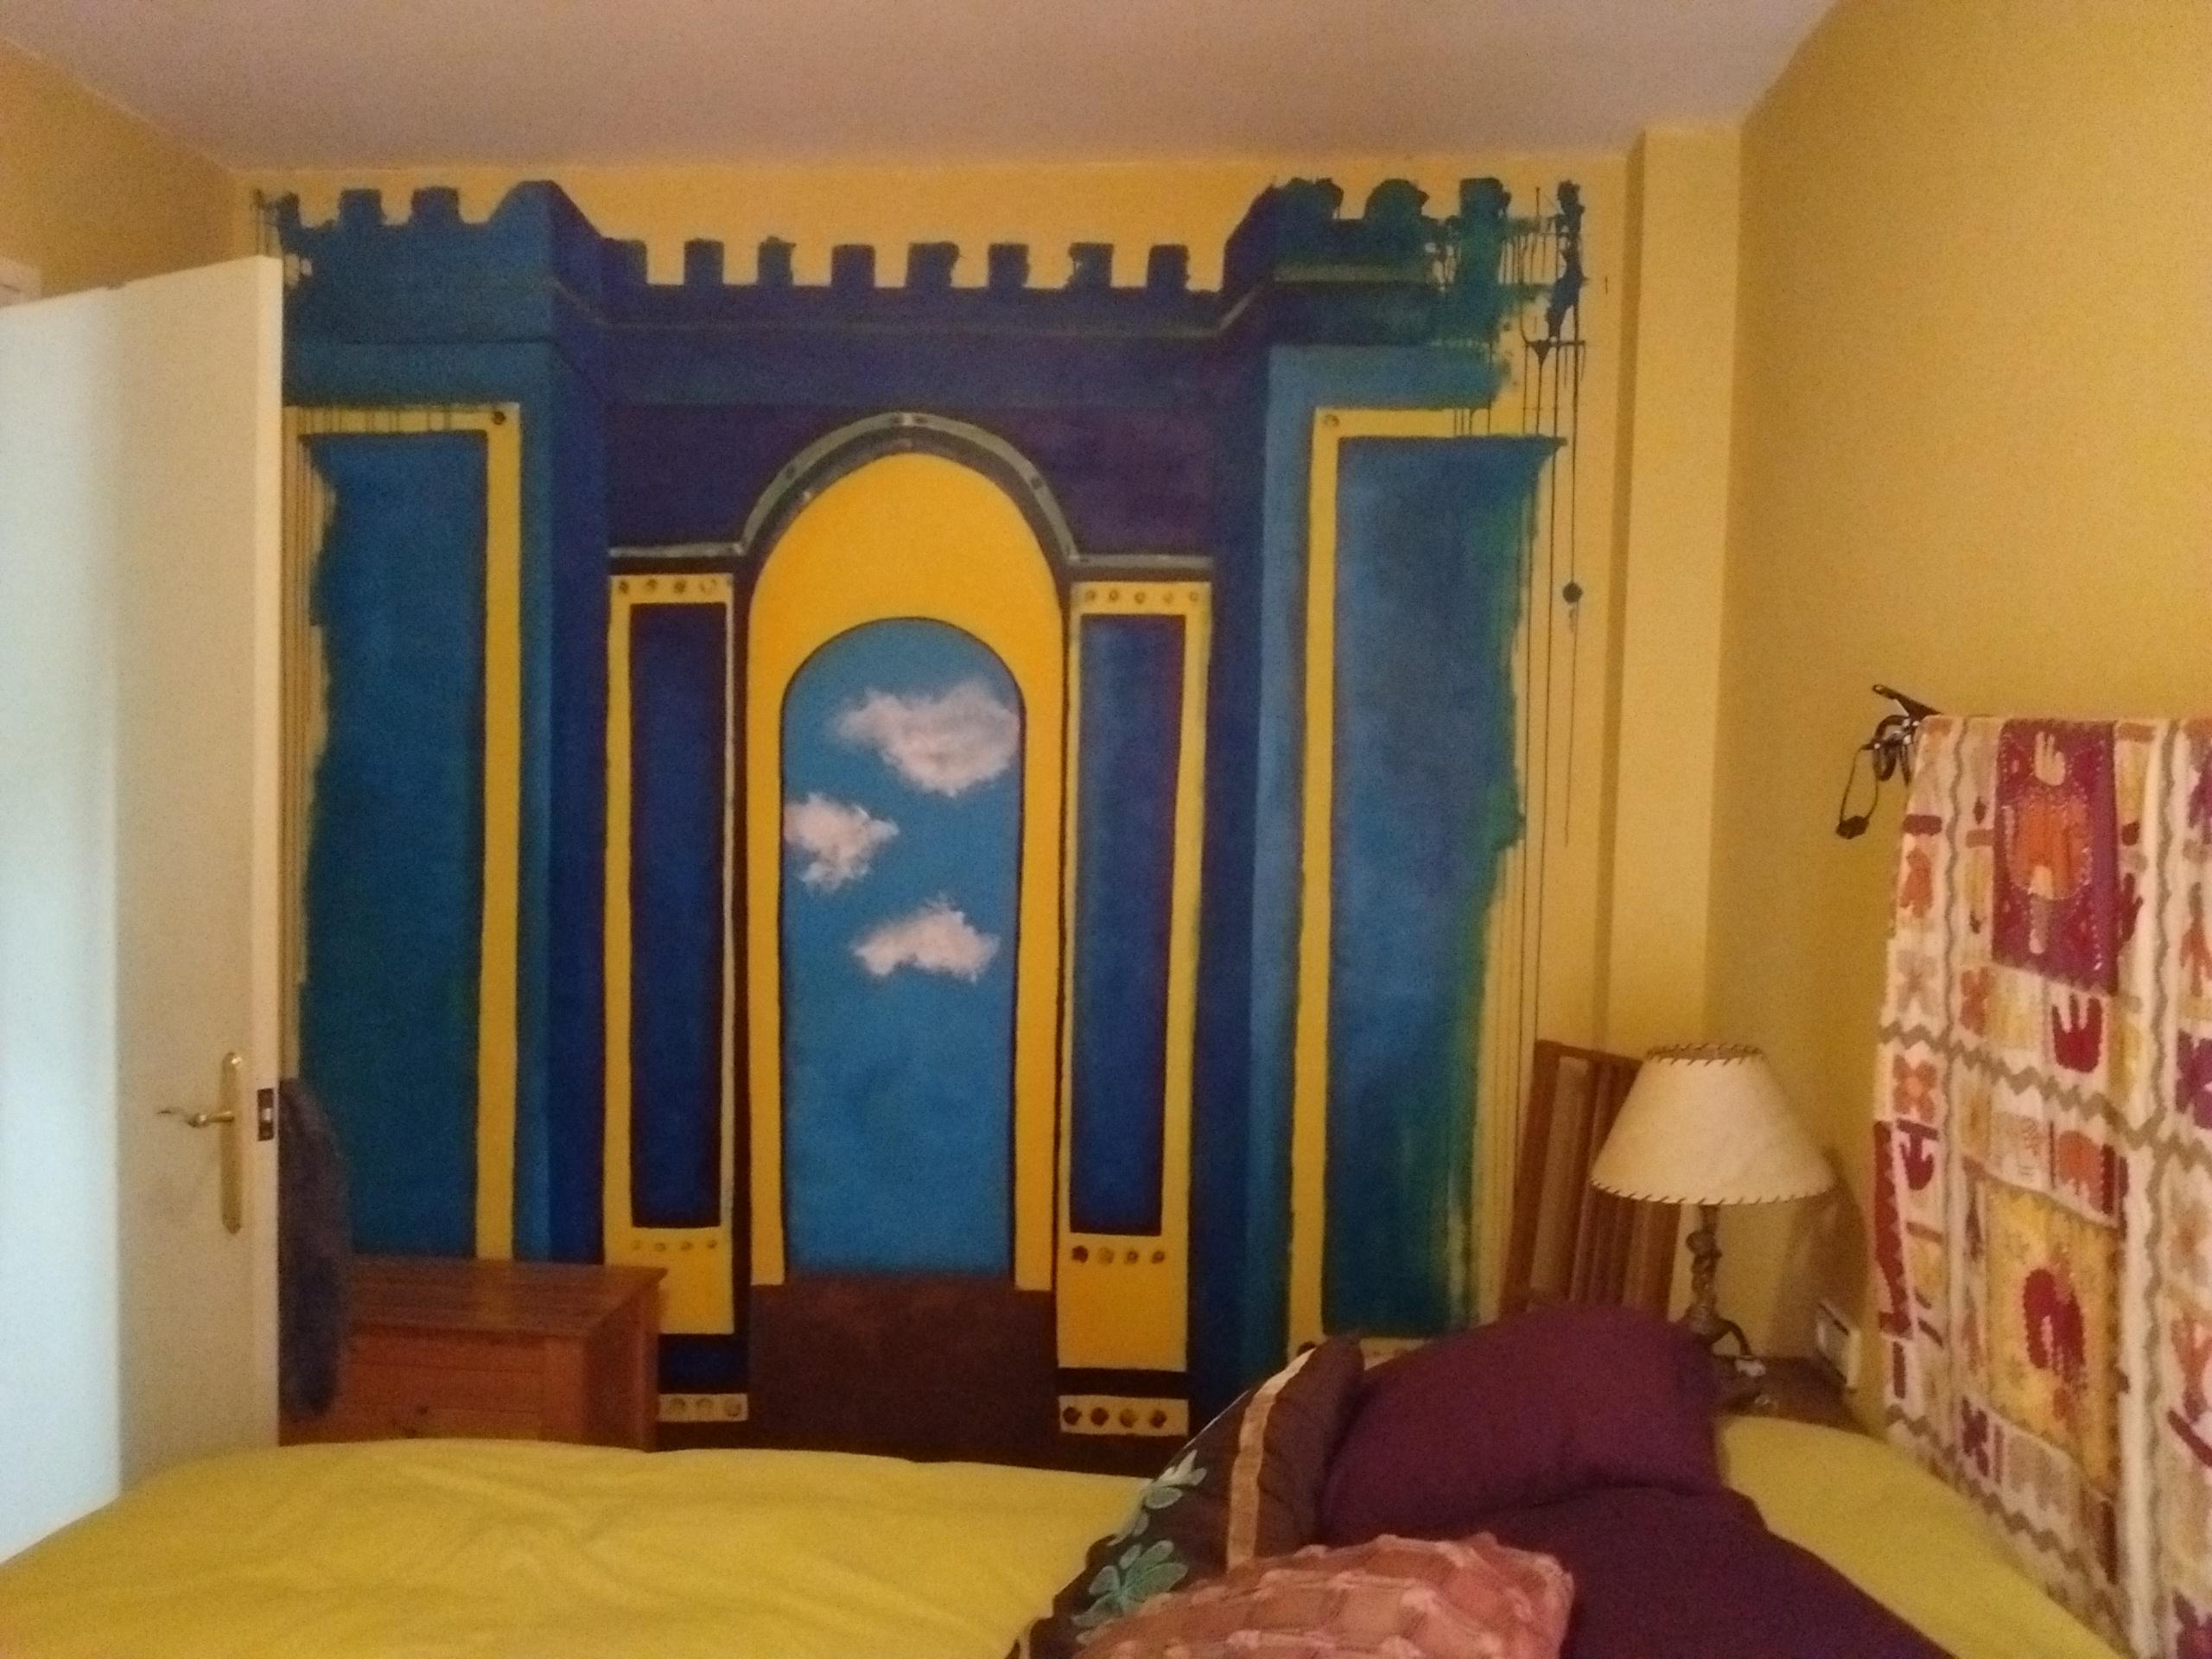 la porta de Babilonia duu